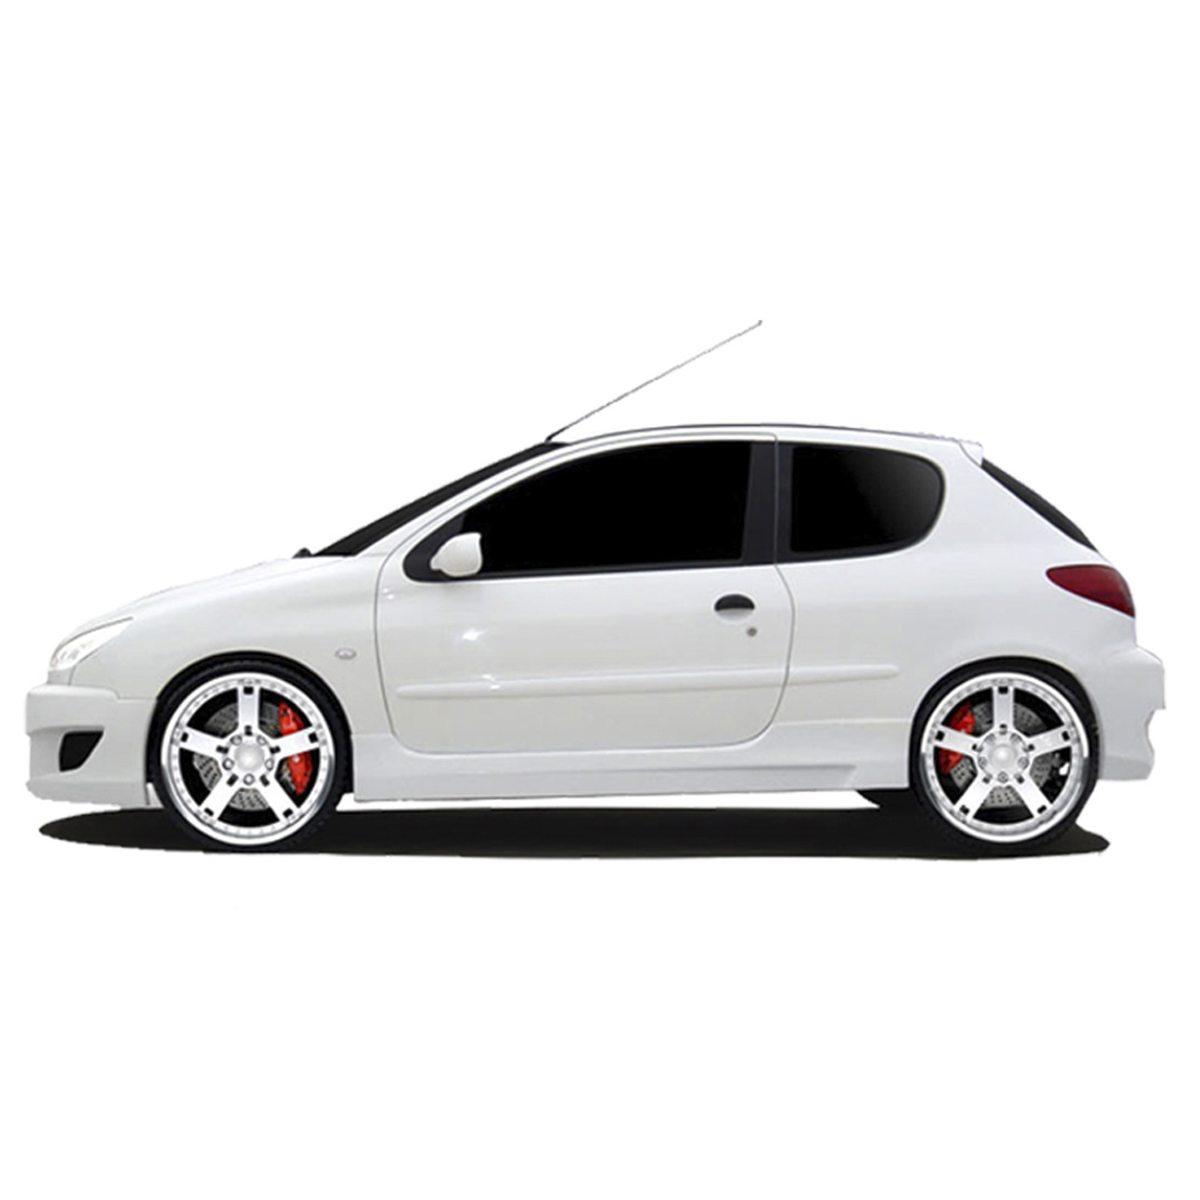 Peugeot-206-Drift-Emb